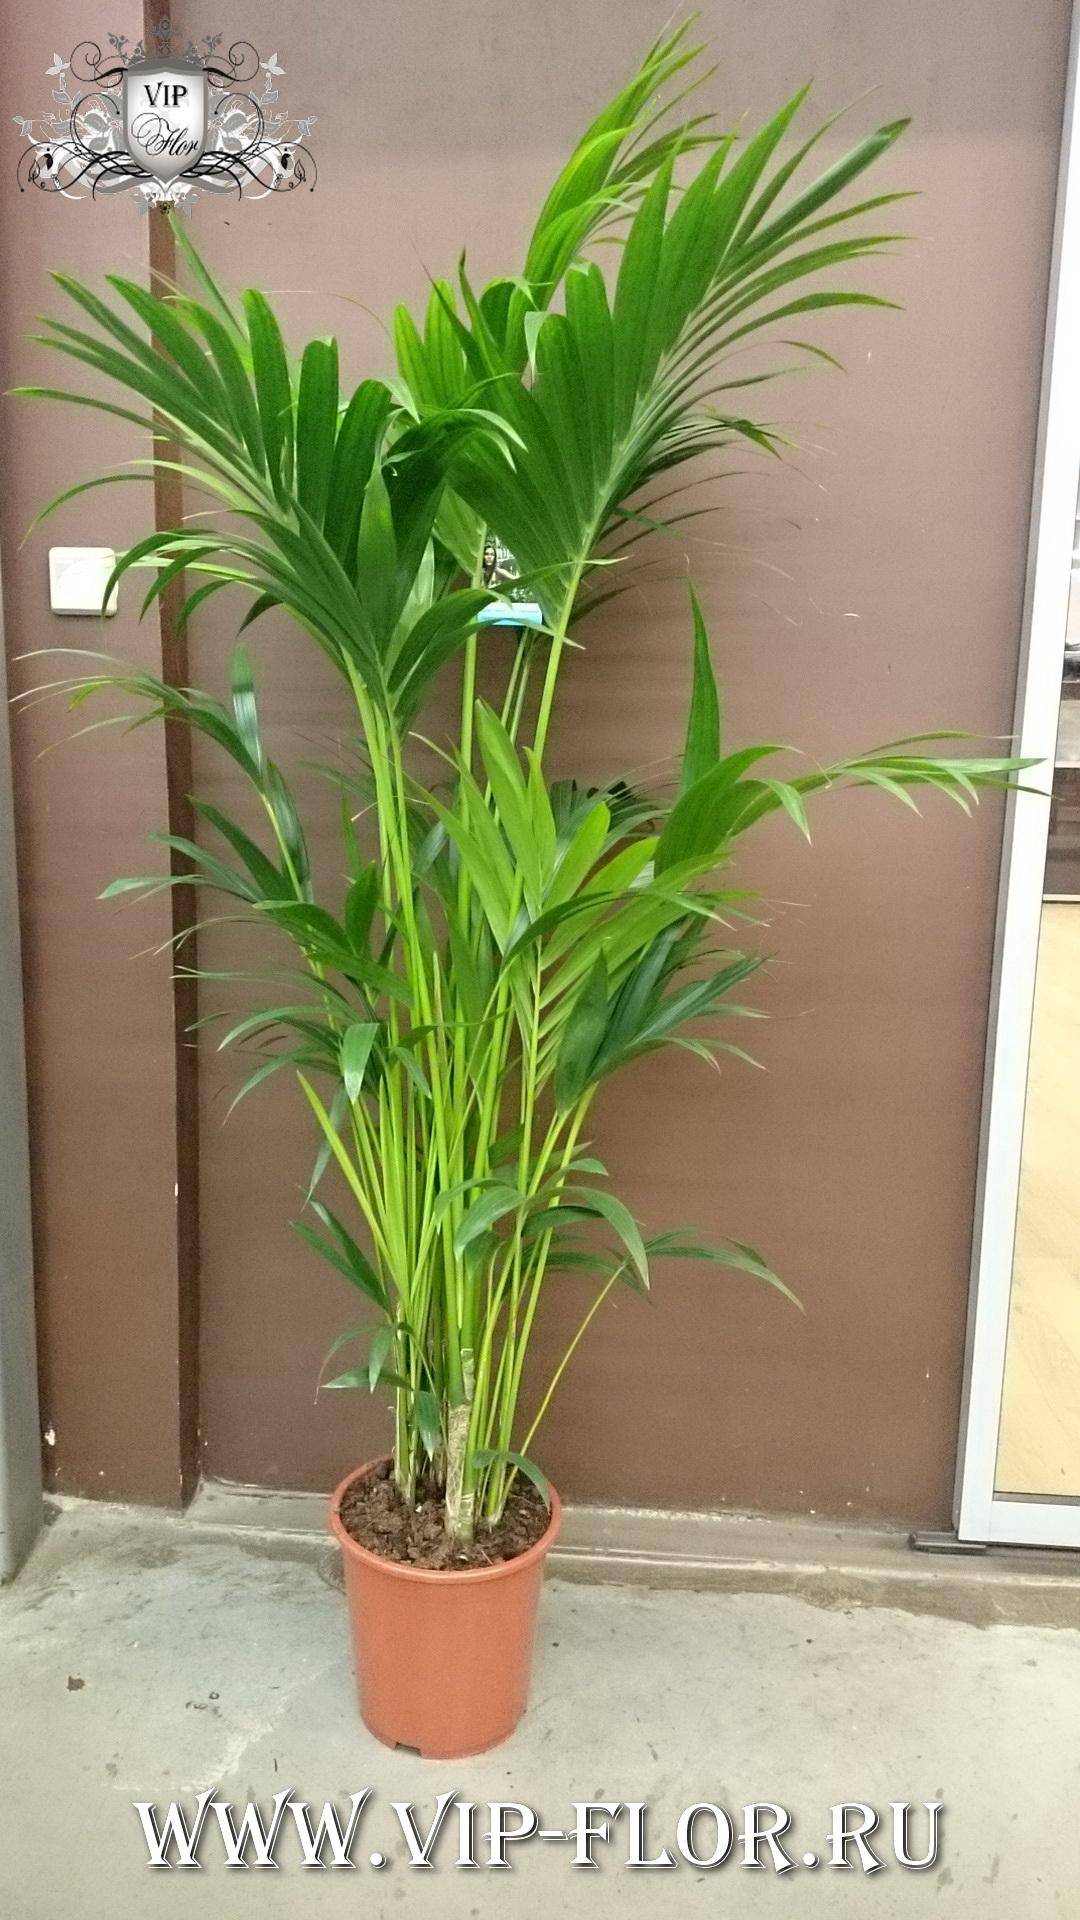 Фото больших комнатных цветов пальмы